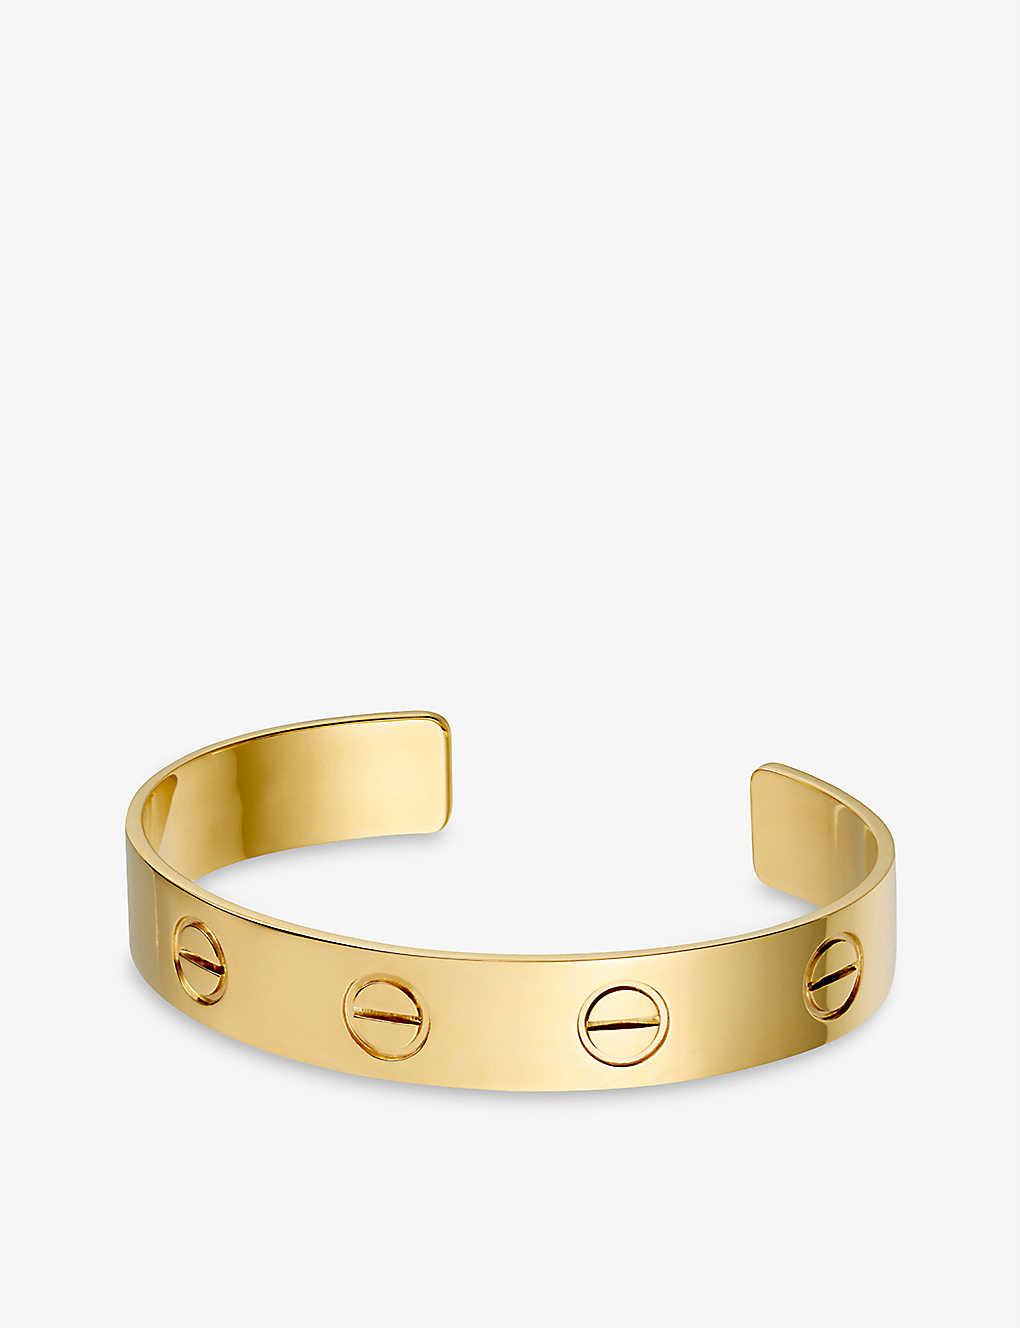 2b2c4c8aa CARTIER - Love 18ct yellow-gold cuff bracelet | Selfridges.com